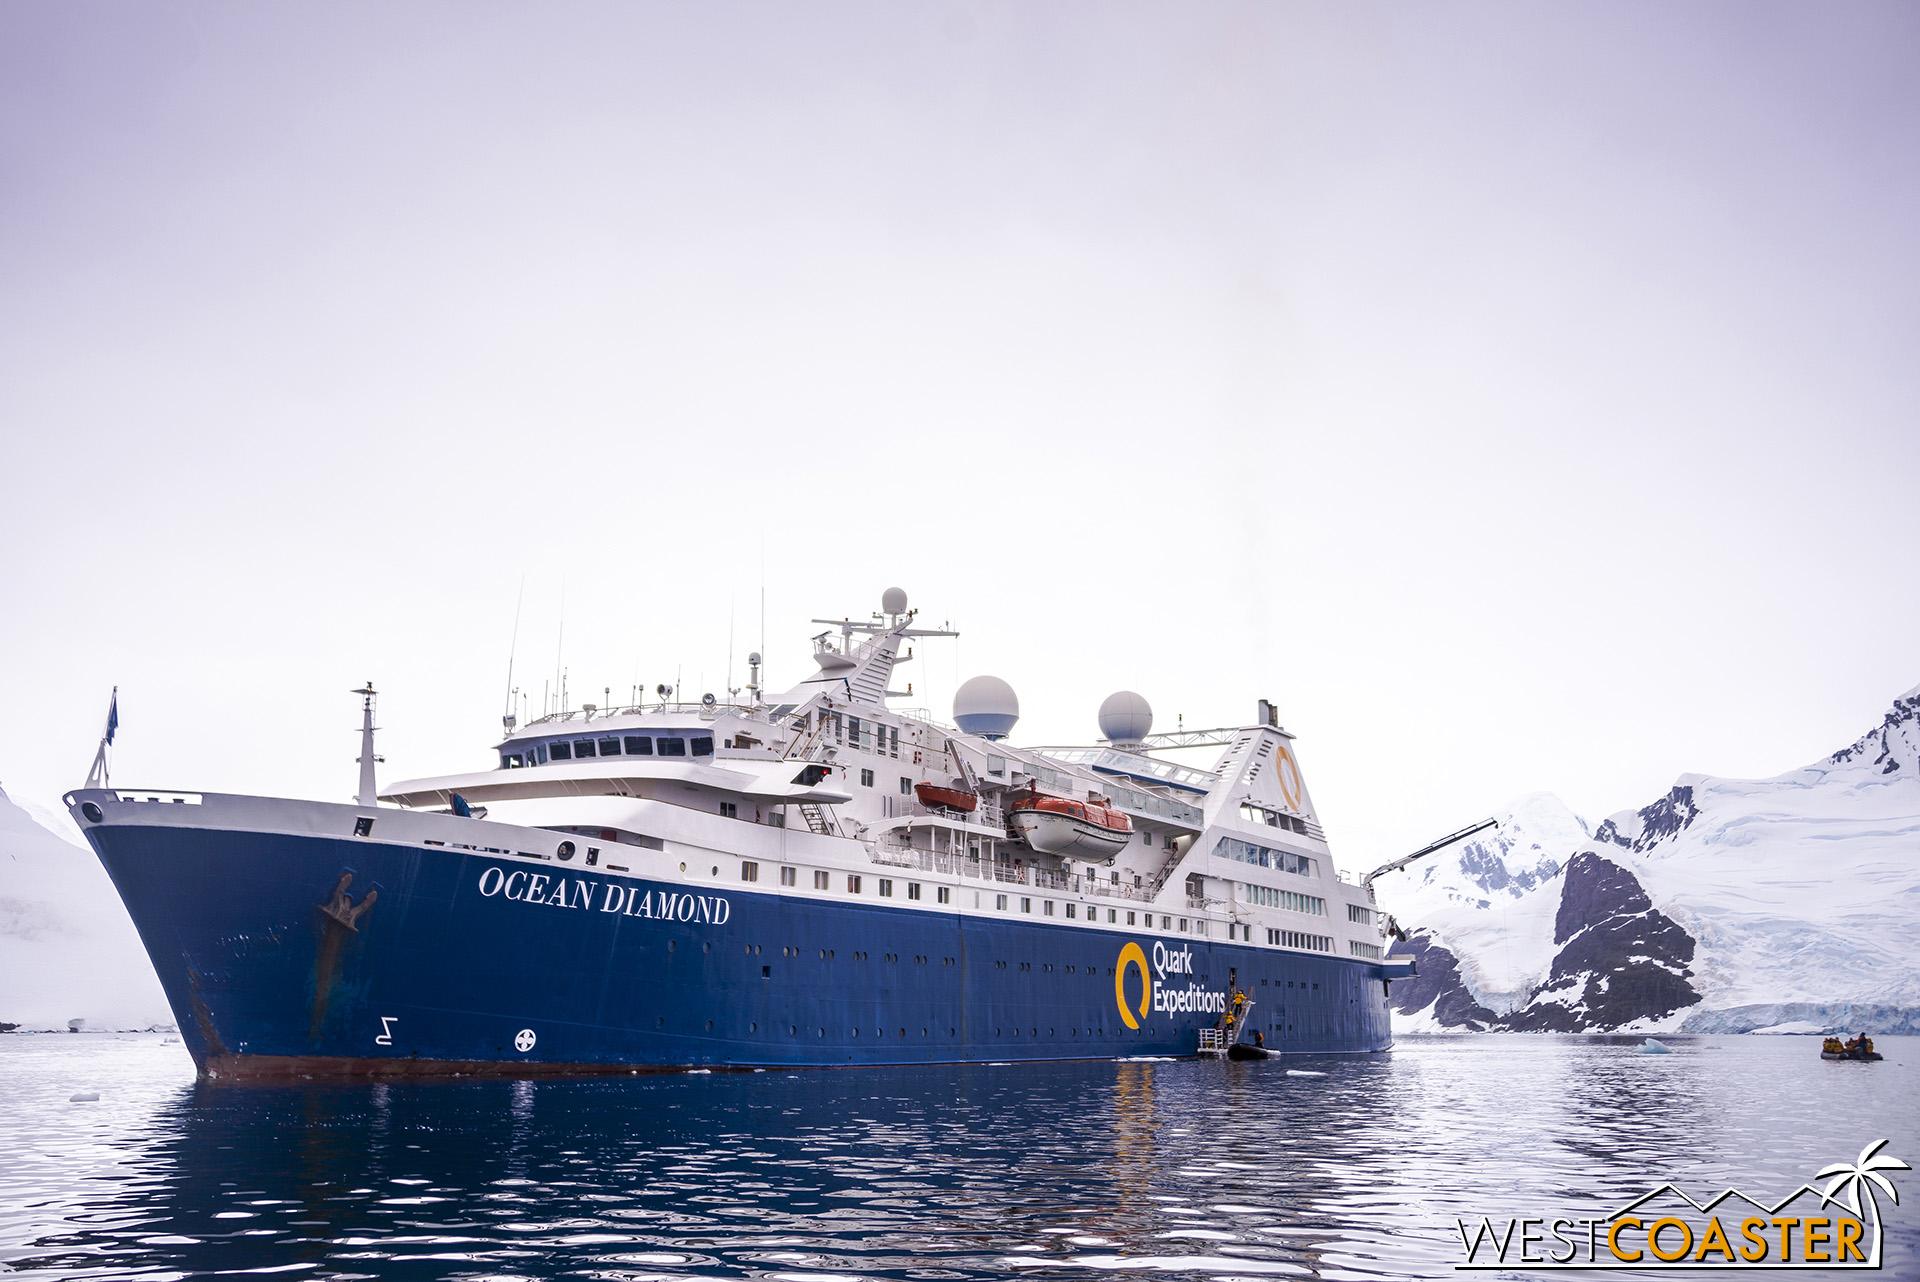 Antarctica-19_0318-B-OceanDiamond-0015.jpg